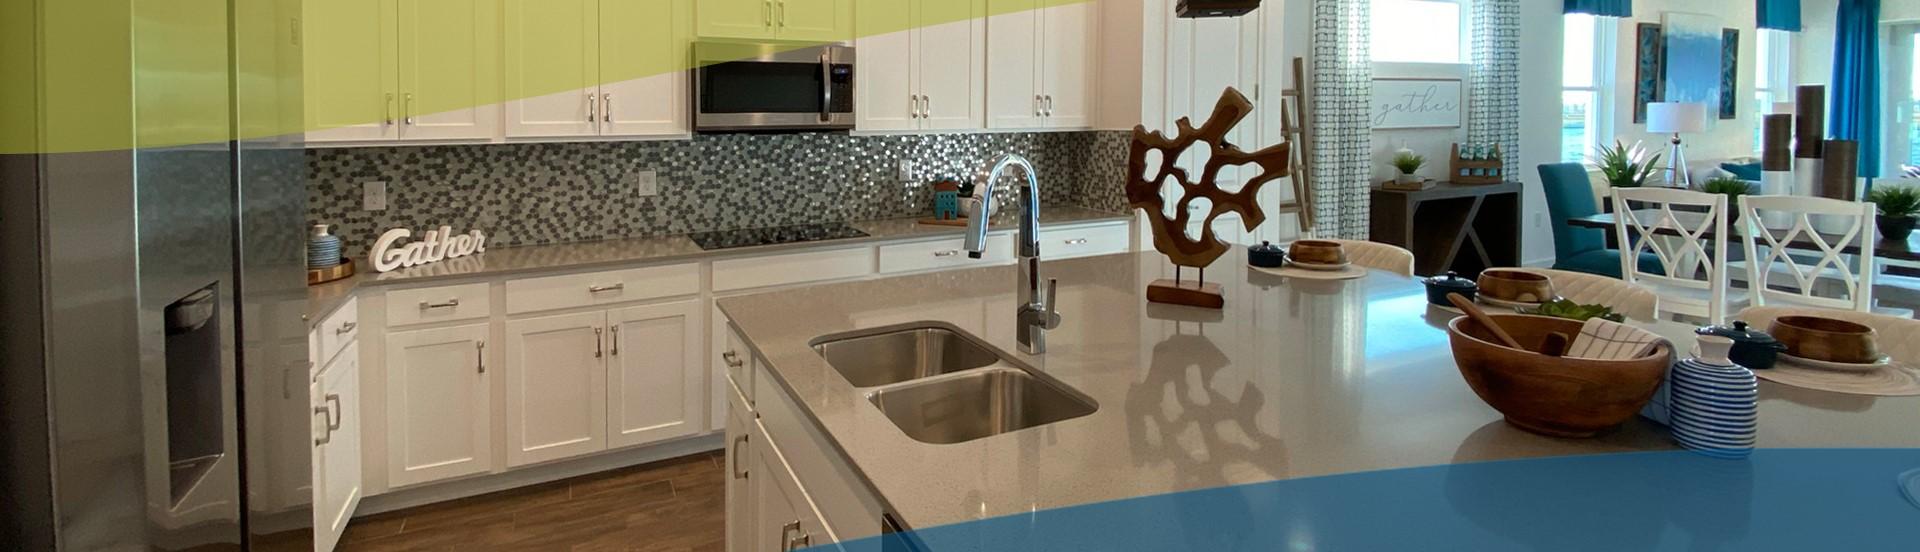 white kitchen with mosaic backsplash at north river ranch